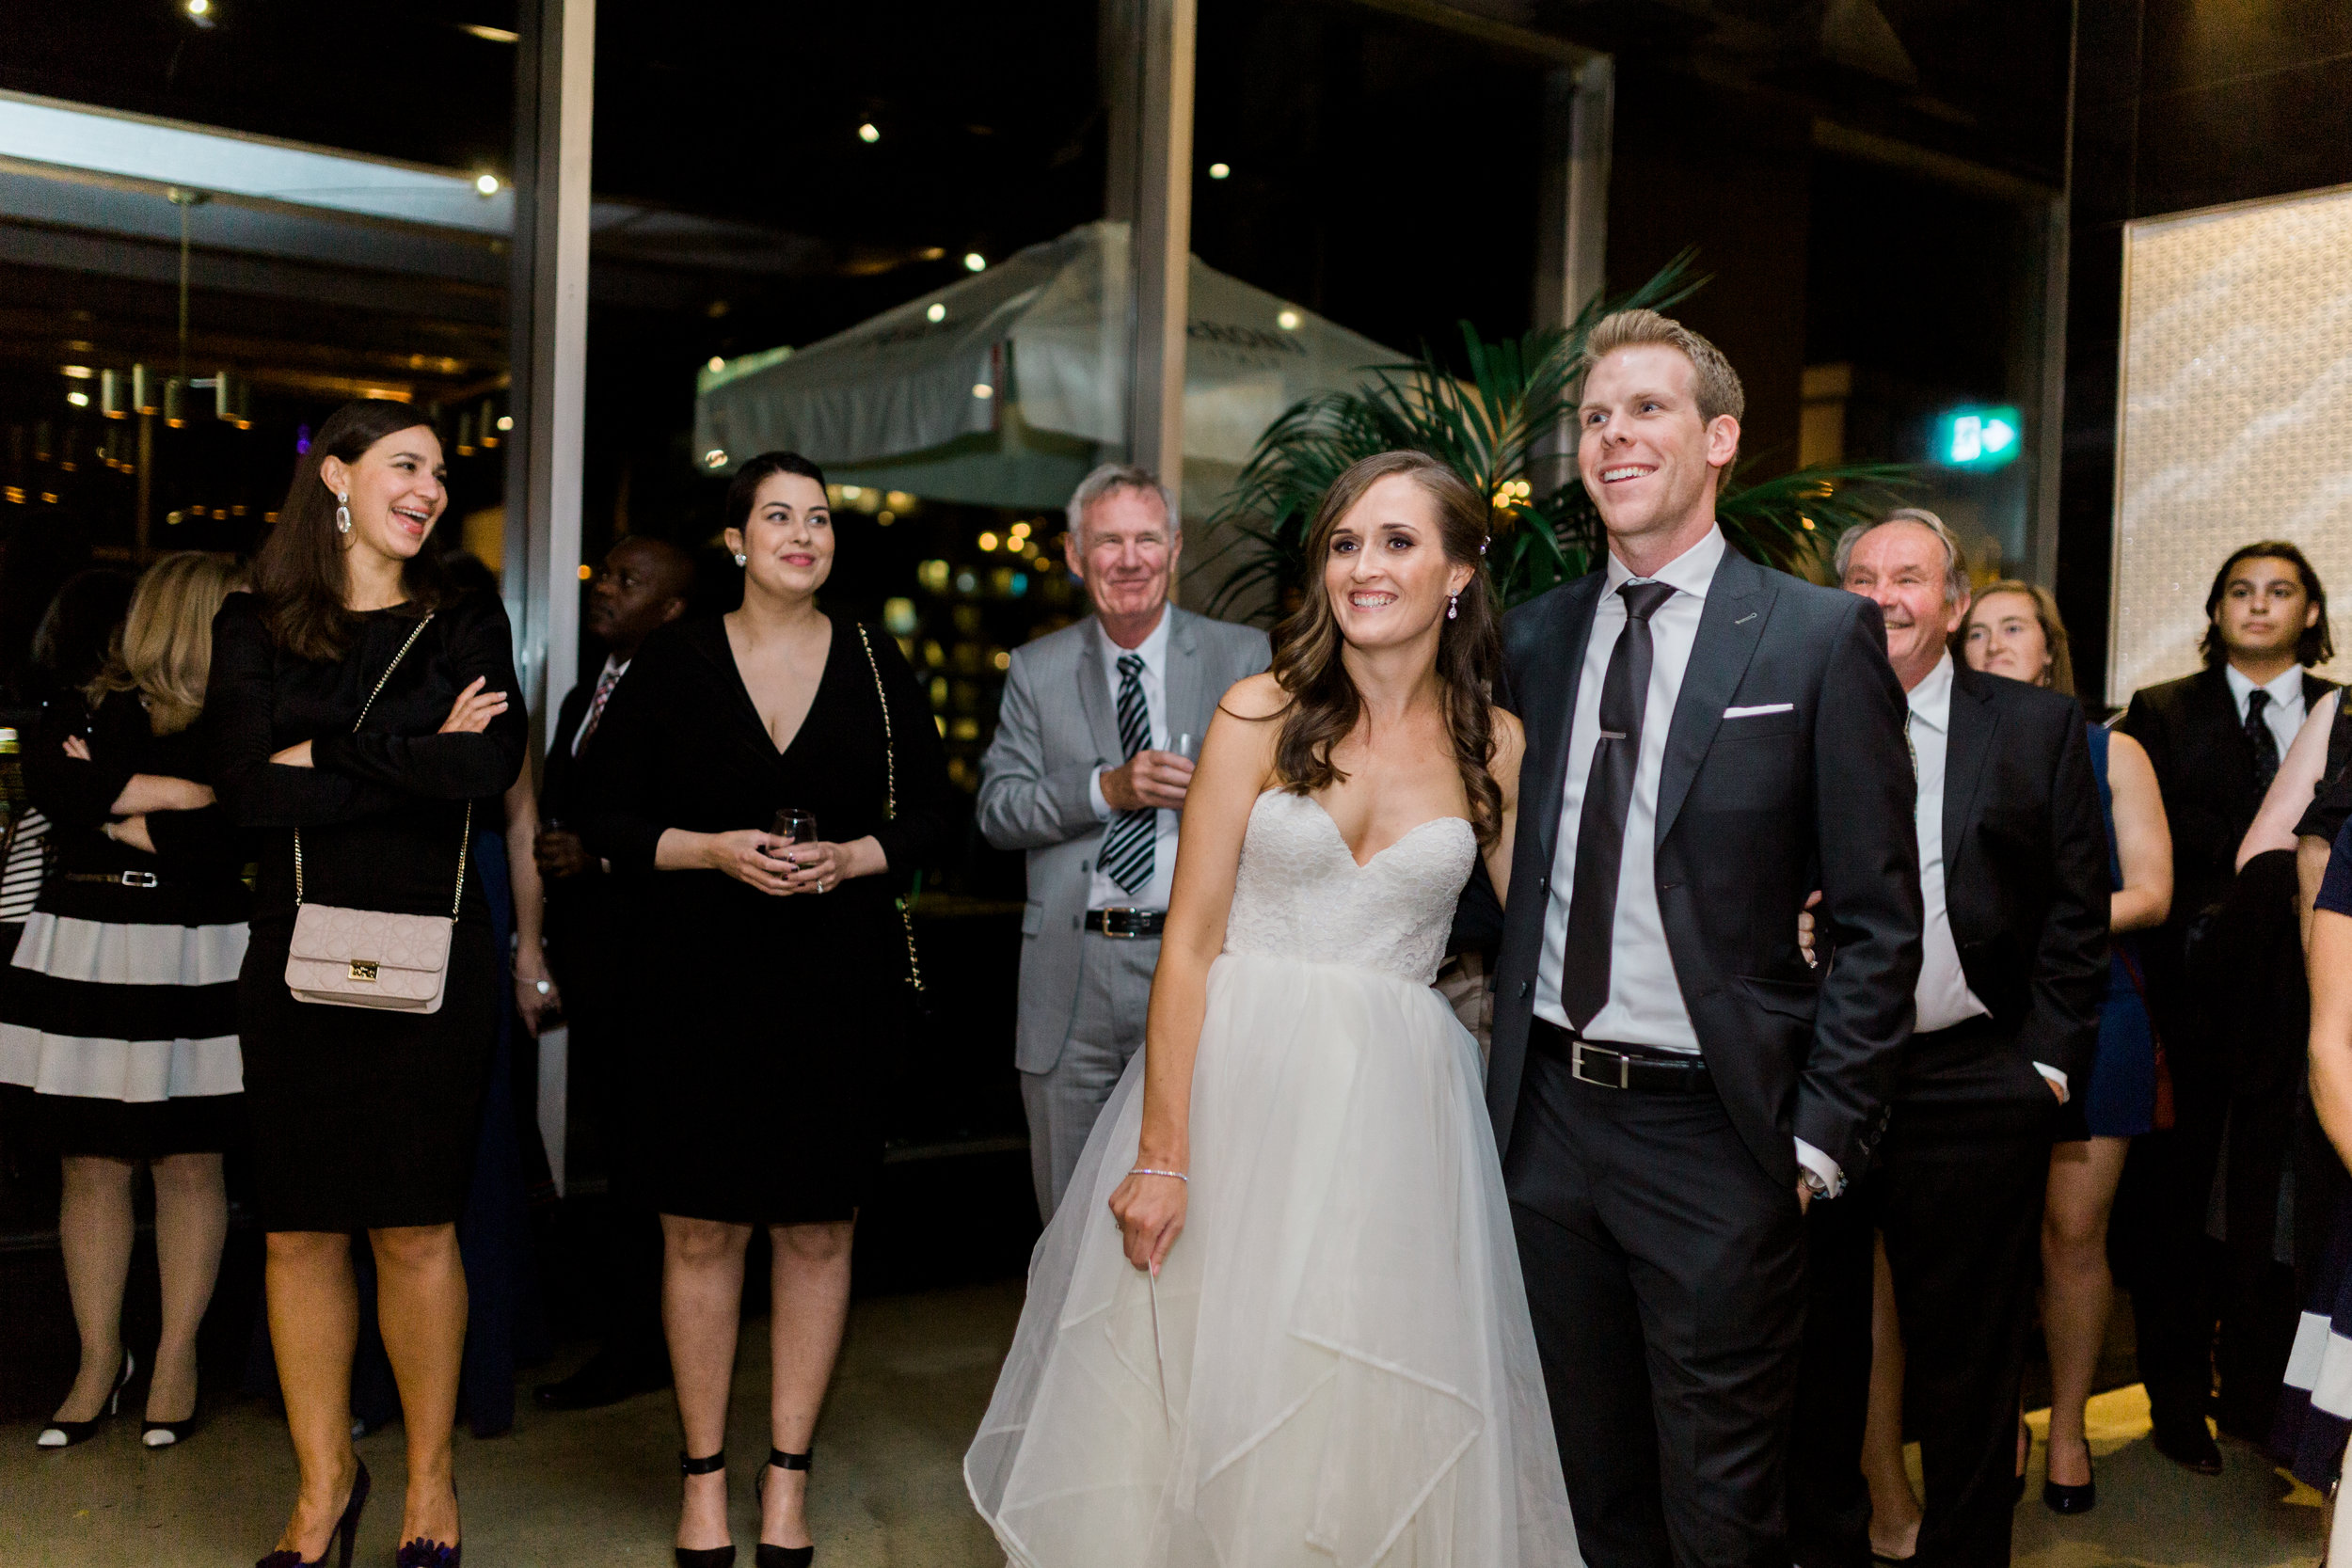 Toronto Fine Art Photographer - 180 Restaurant Wedding - Ceremony-95.jpg